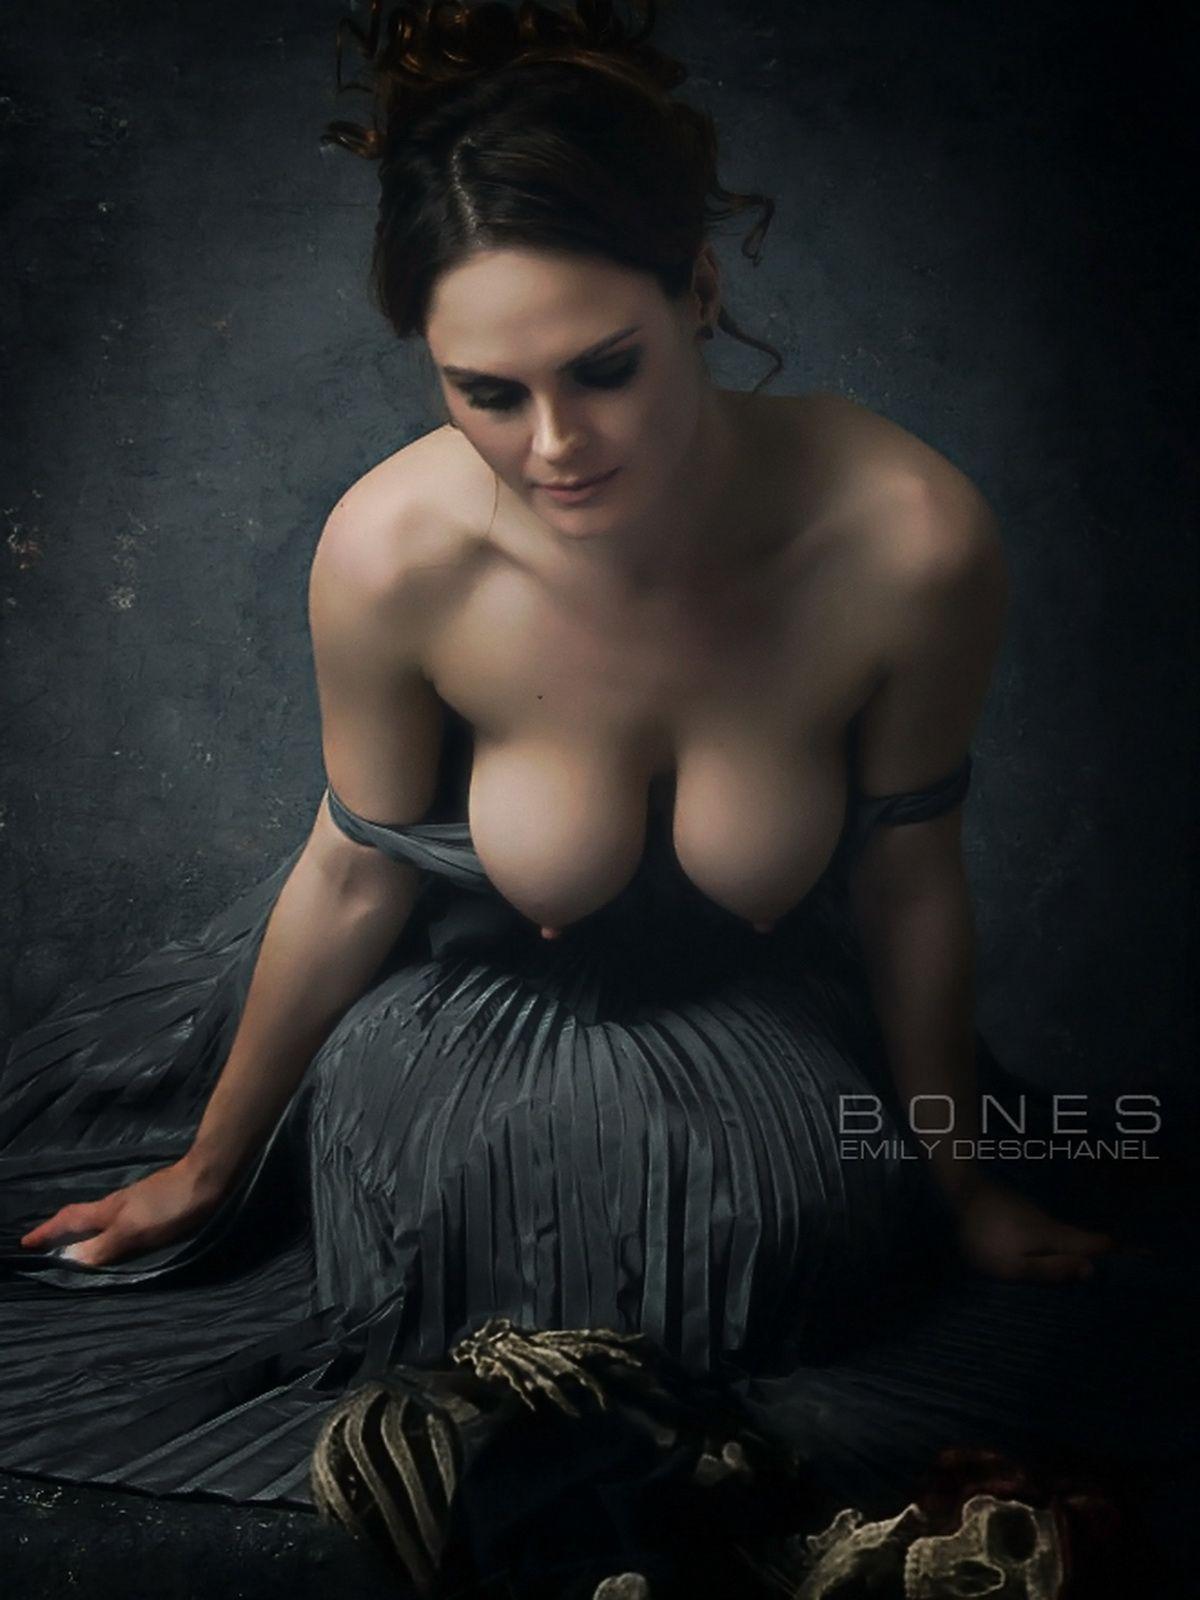 Emily Deschanel Galerie nackt